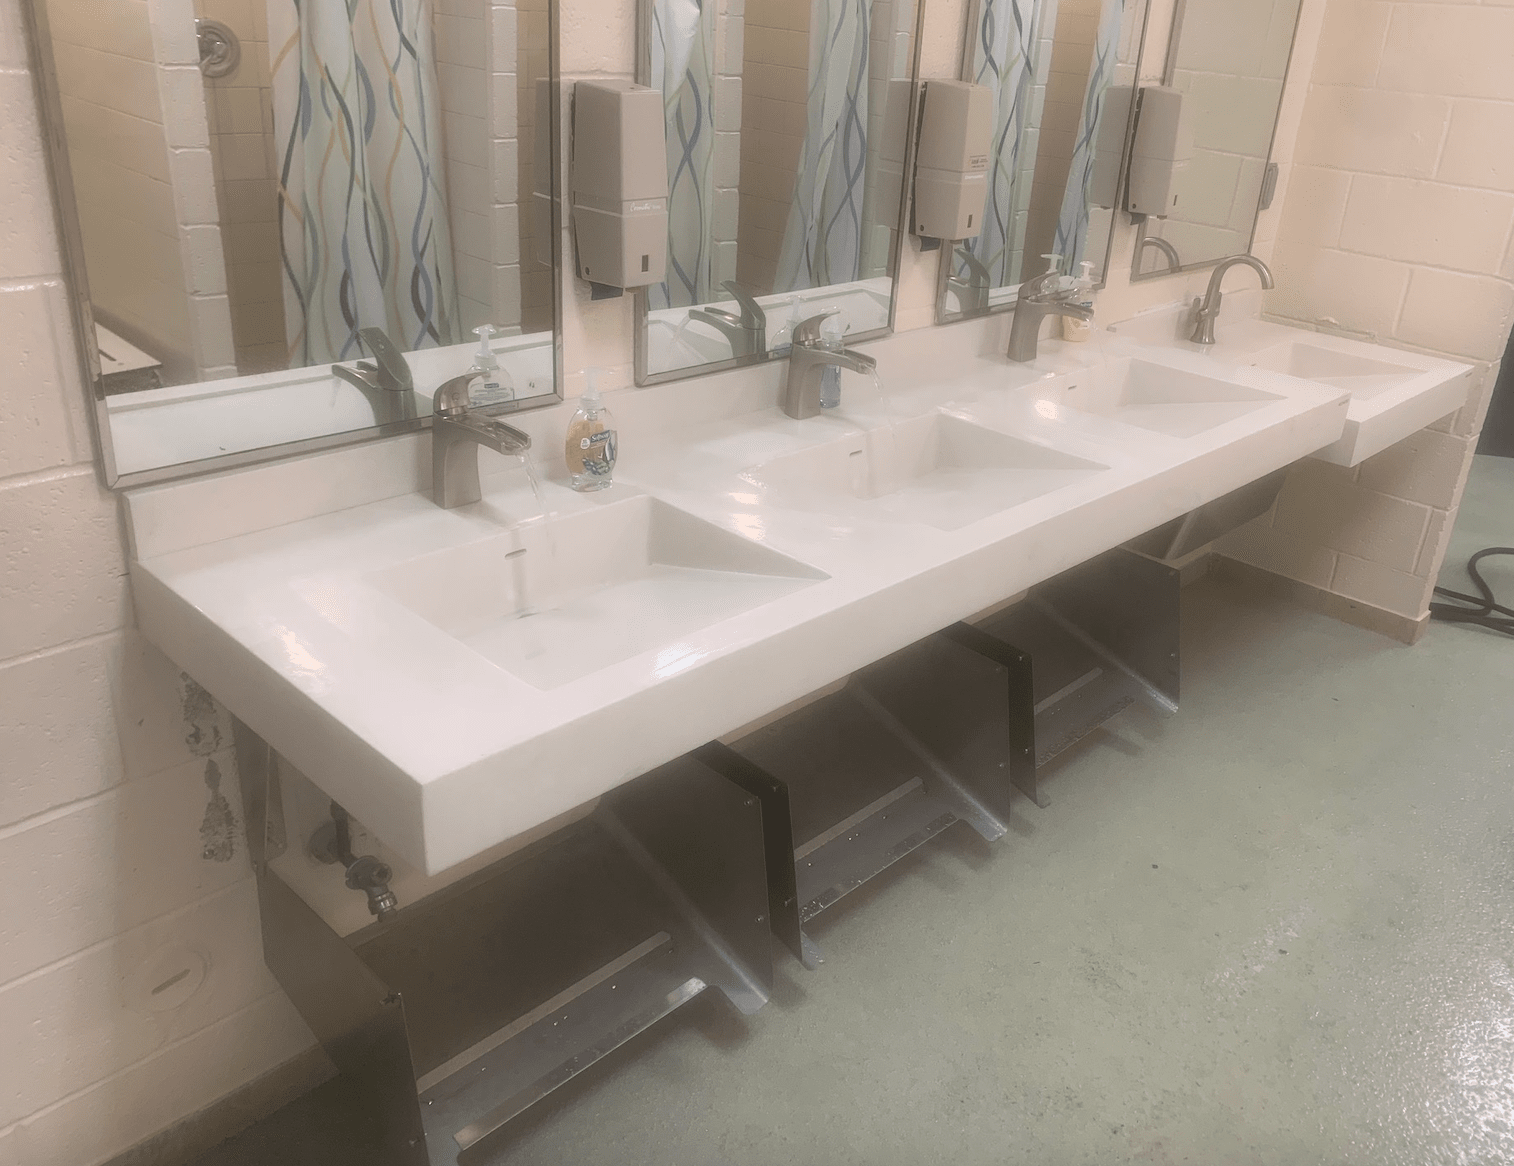 Commercial bathroom in Laurel, MD from FLOORMAX